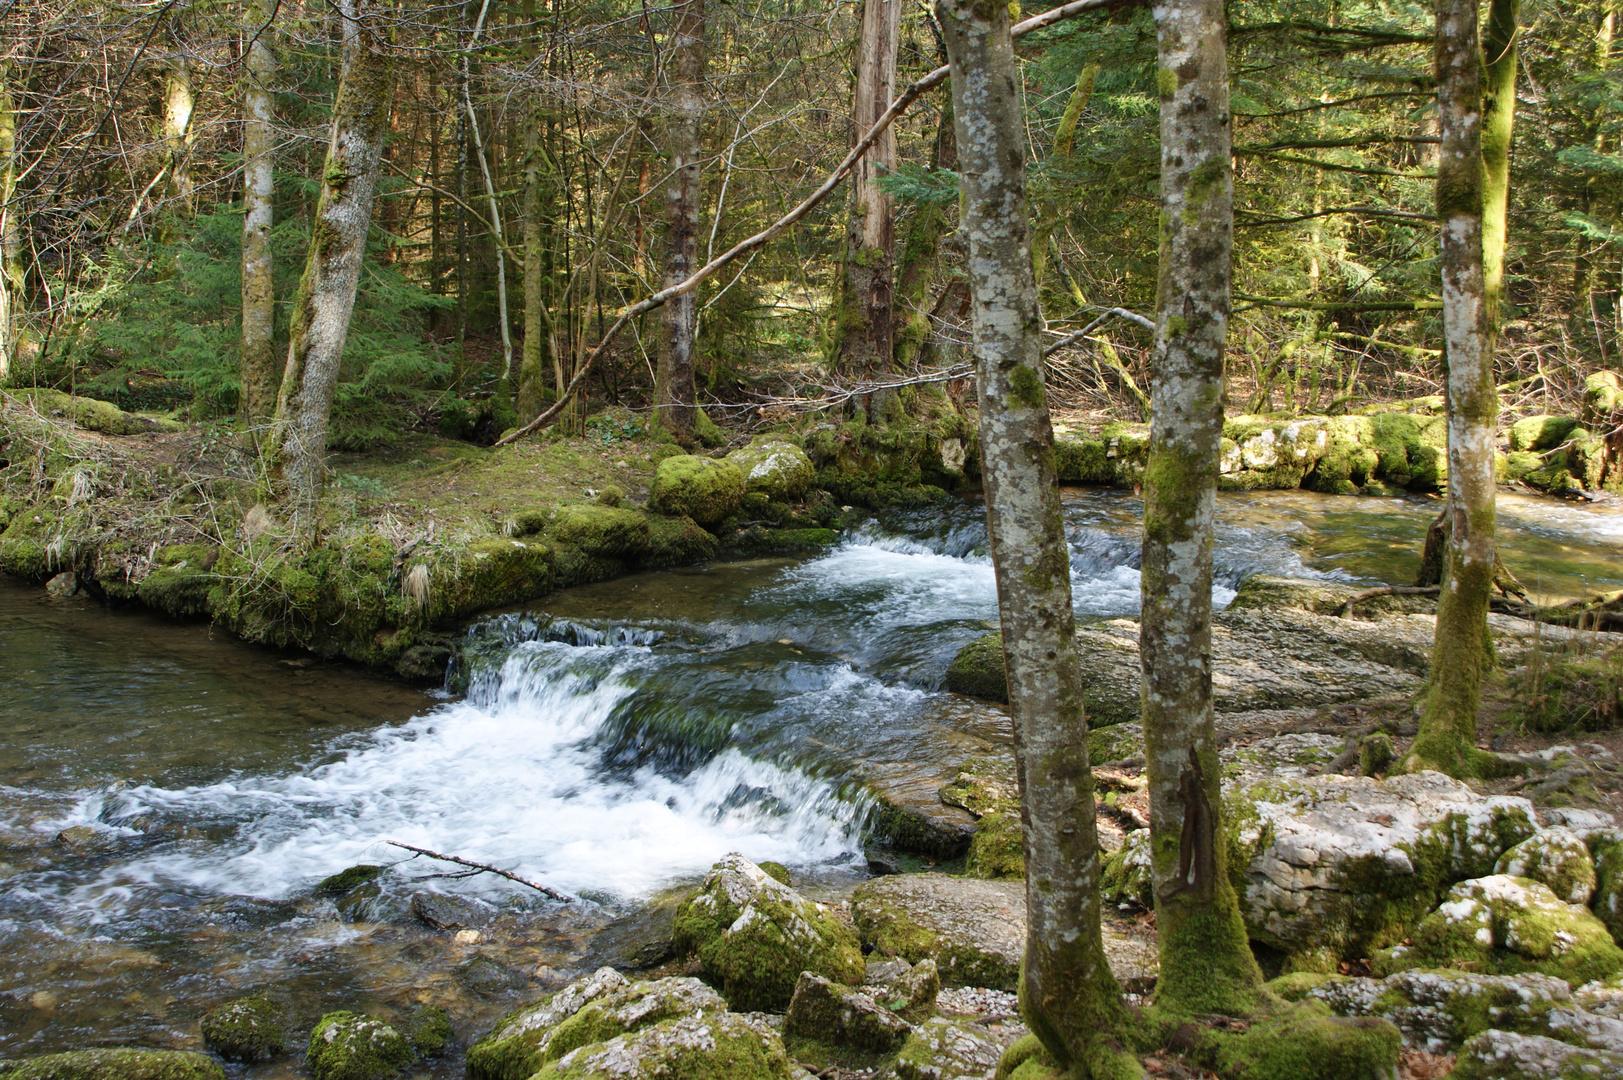 petit riviere tranquille